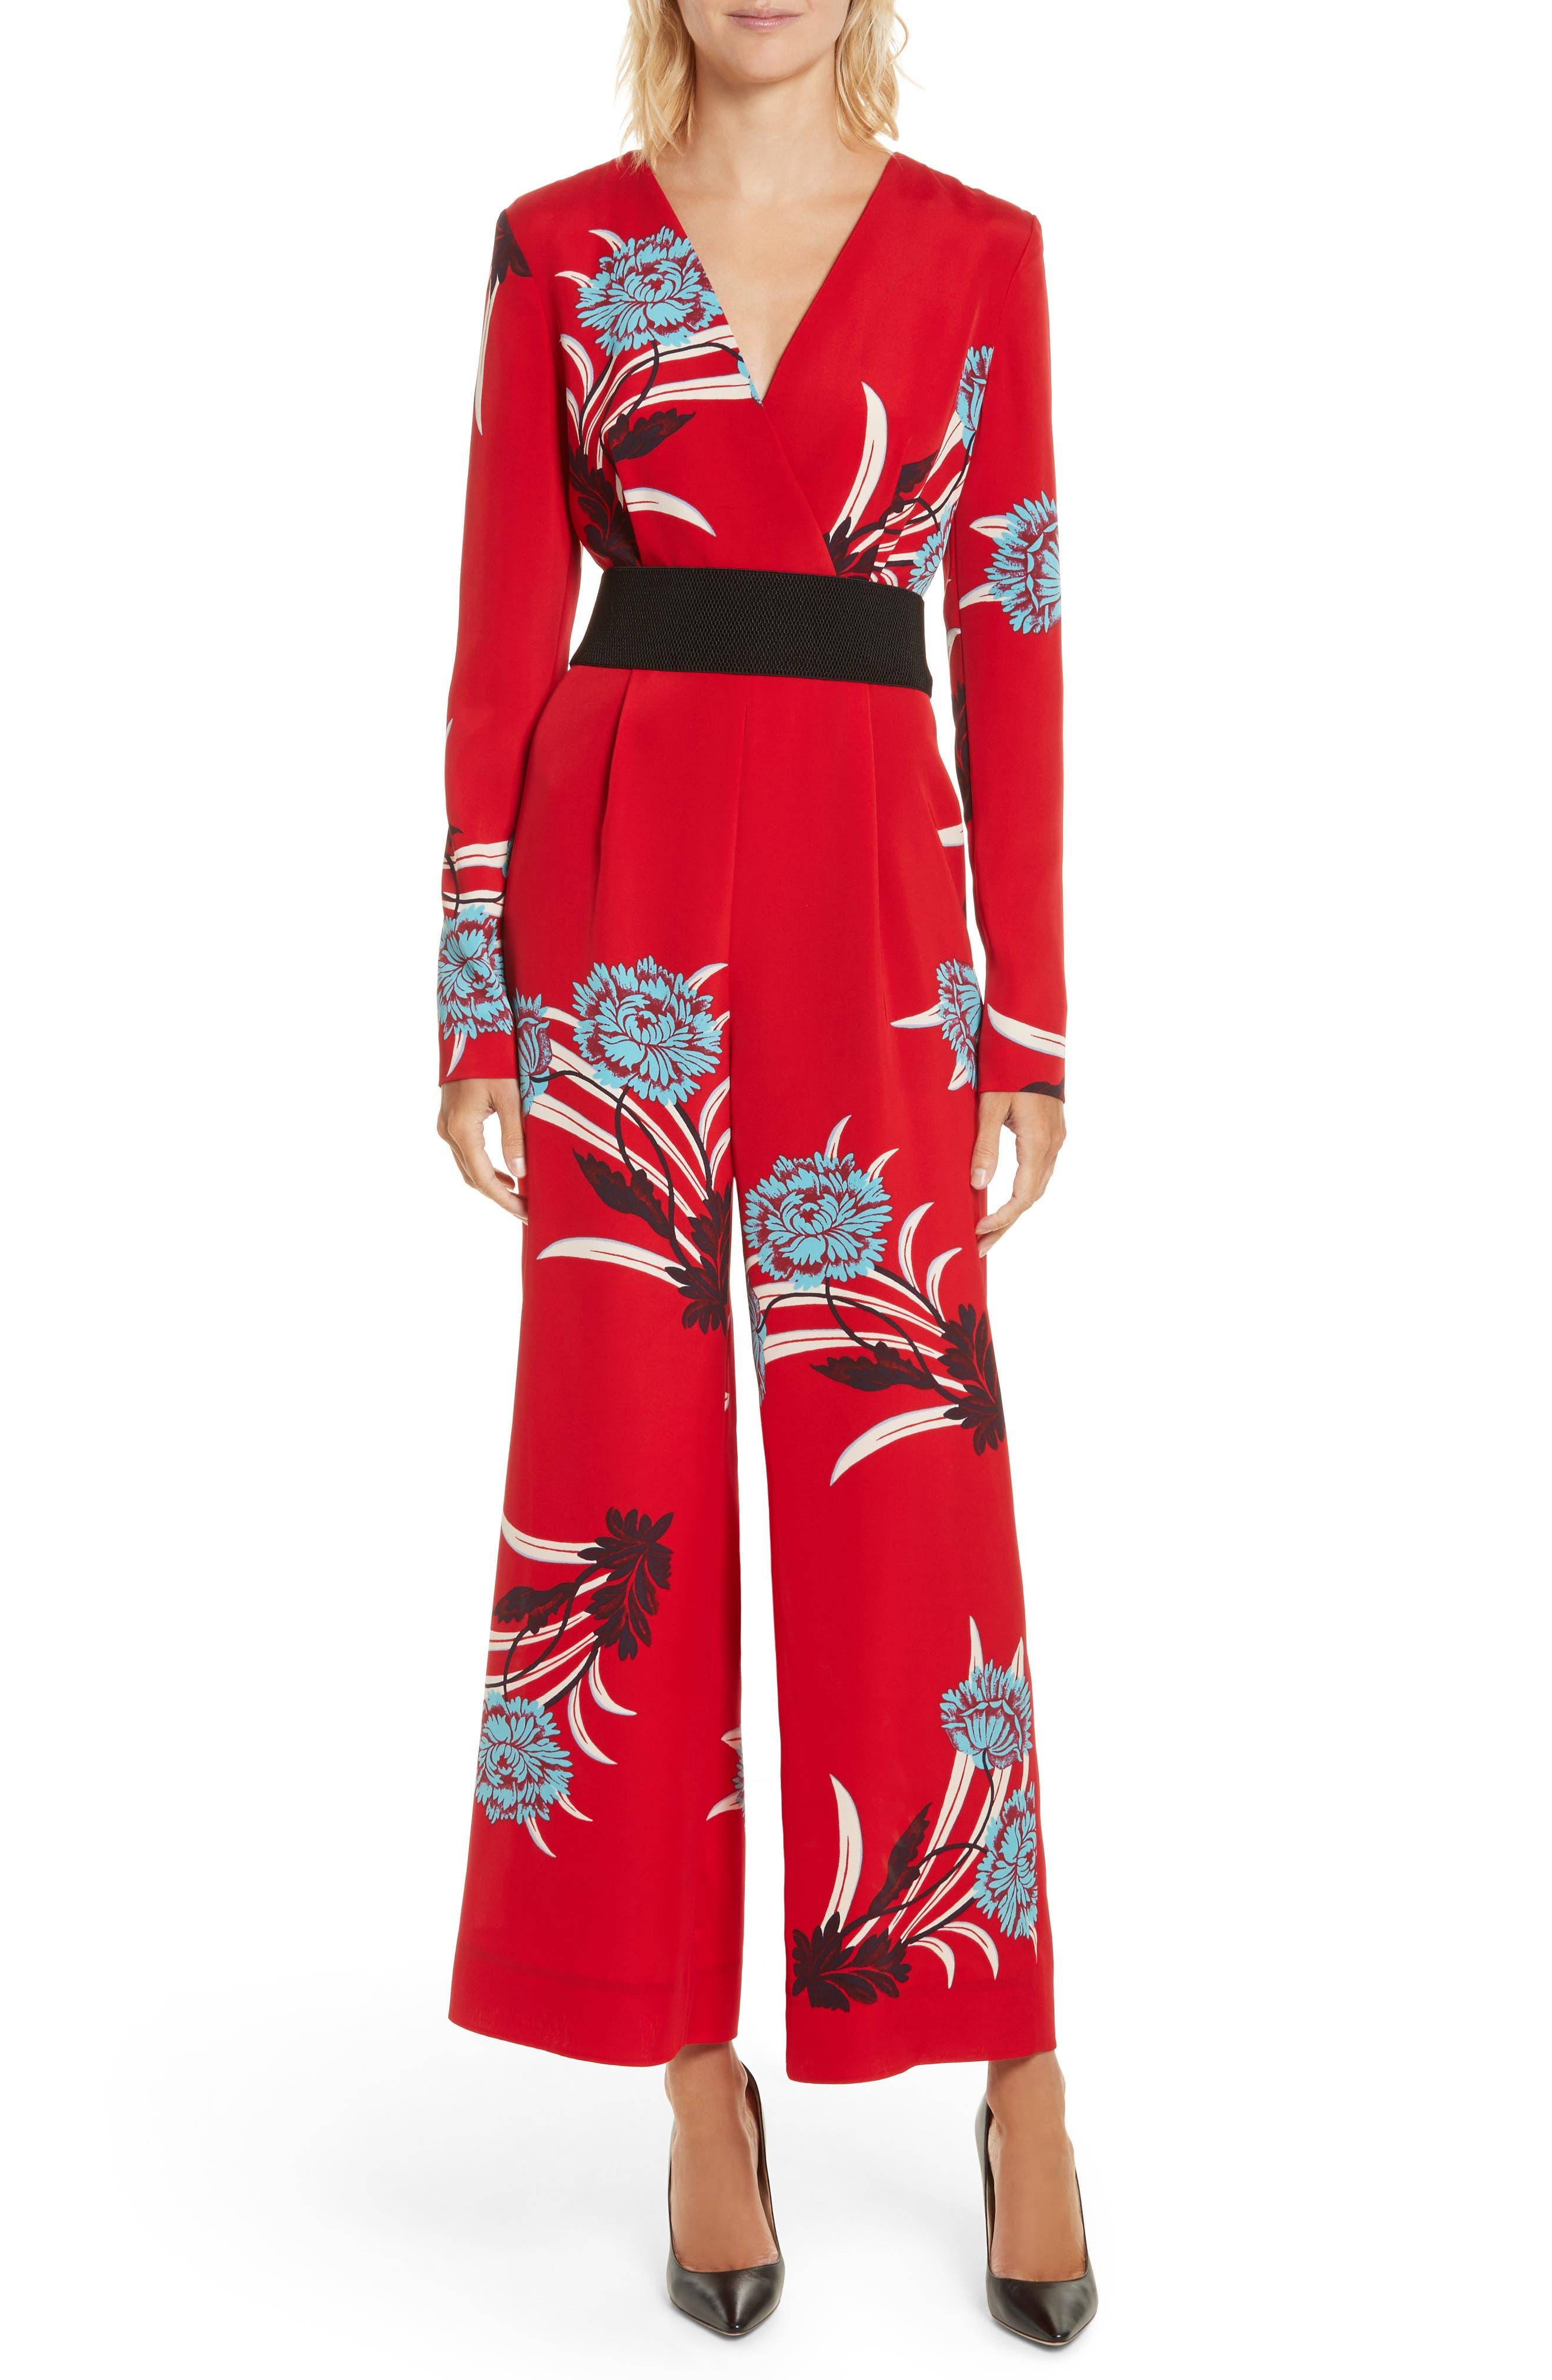 DIANE VON FURSTENBERG Floral Print Crossover Jumpsuit, Main, color, 648